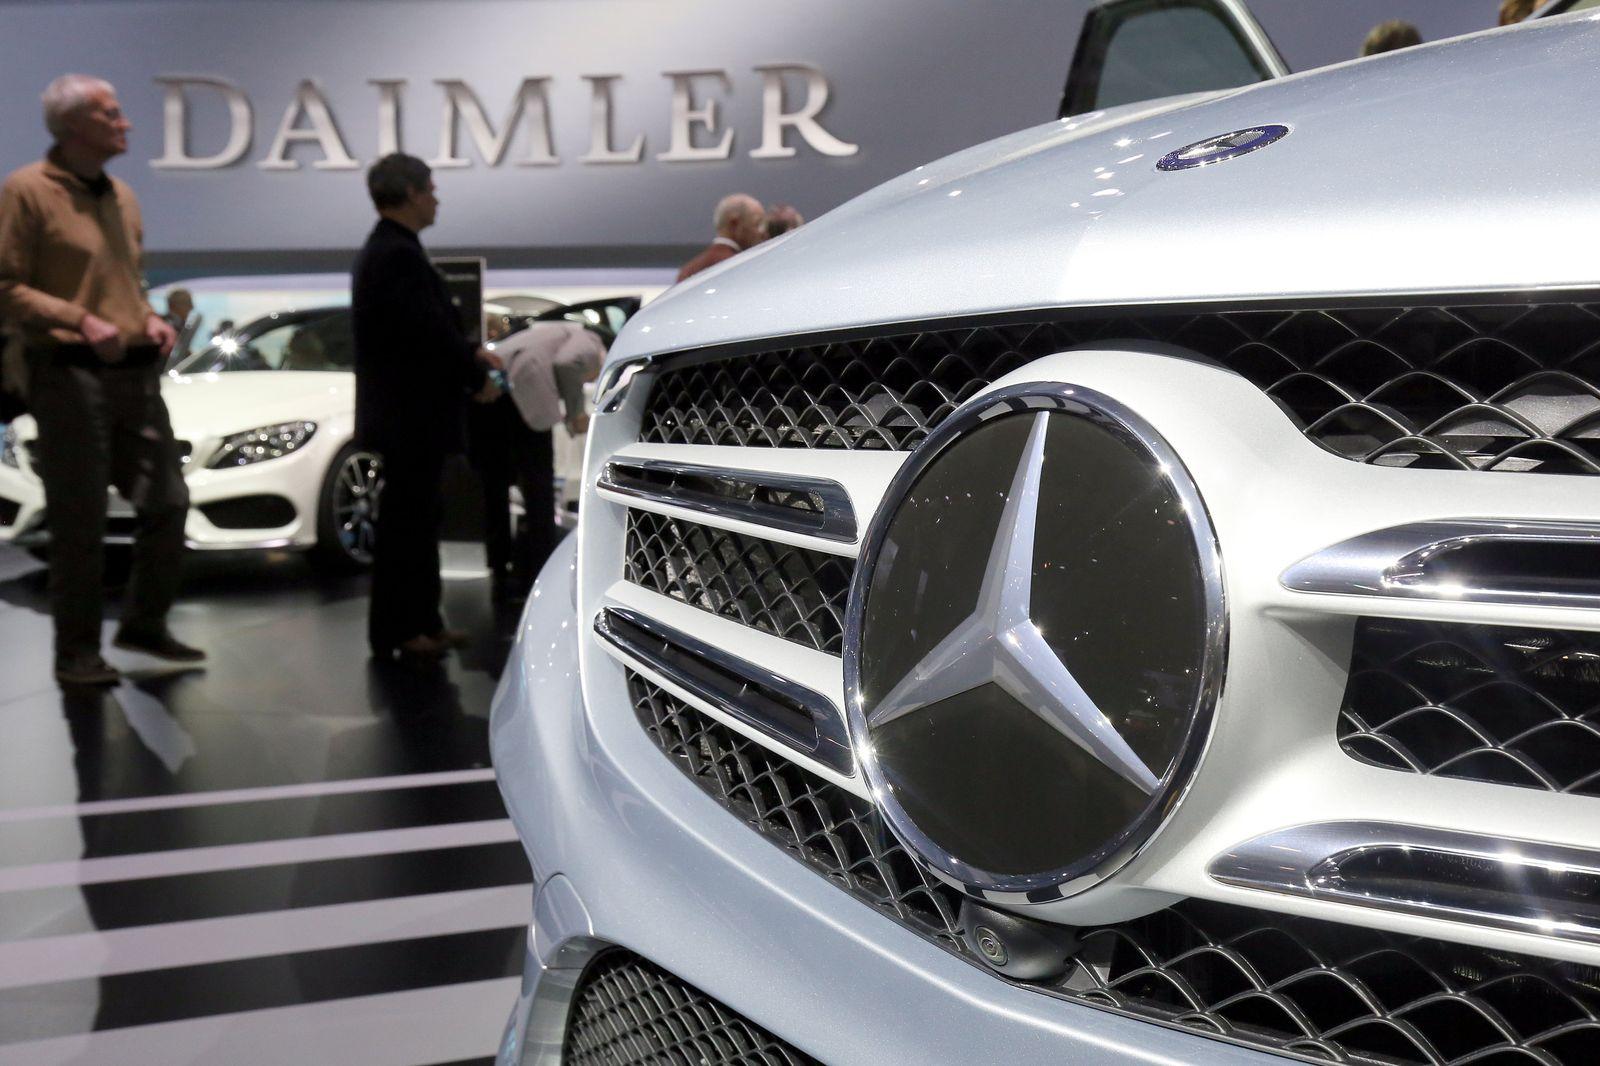 Daimler / Diesel / Motorhaube